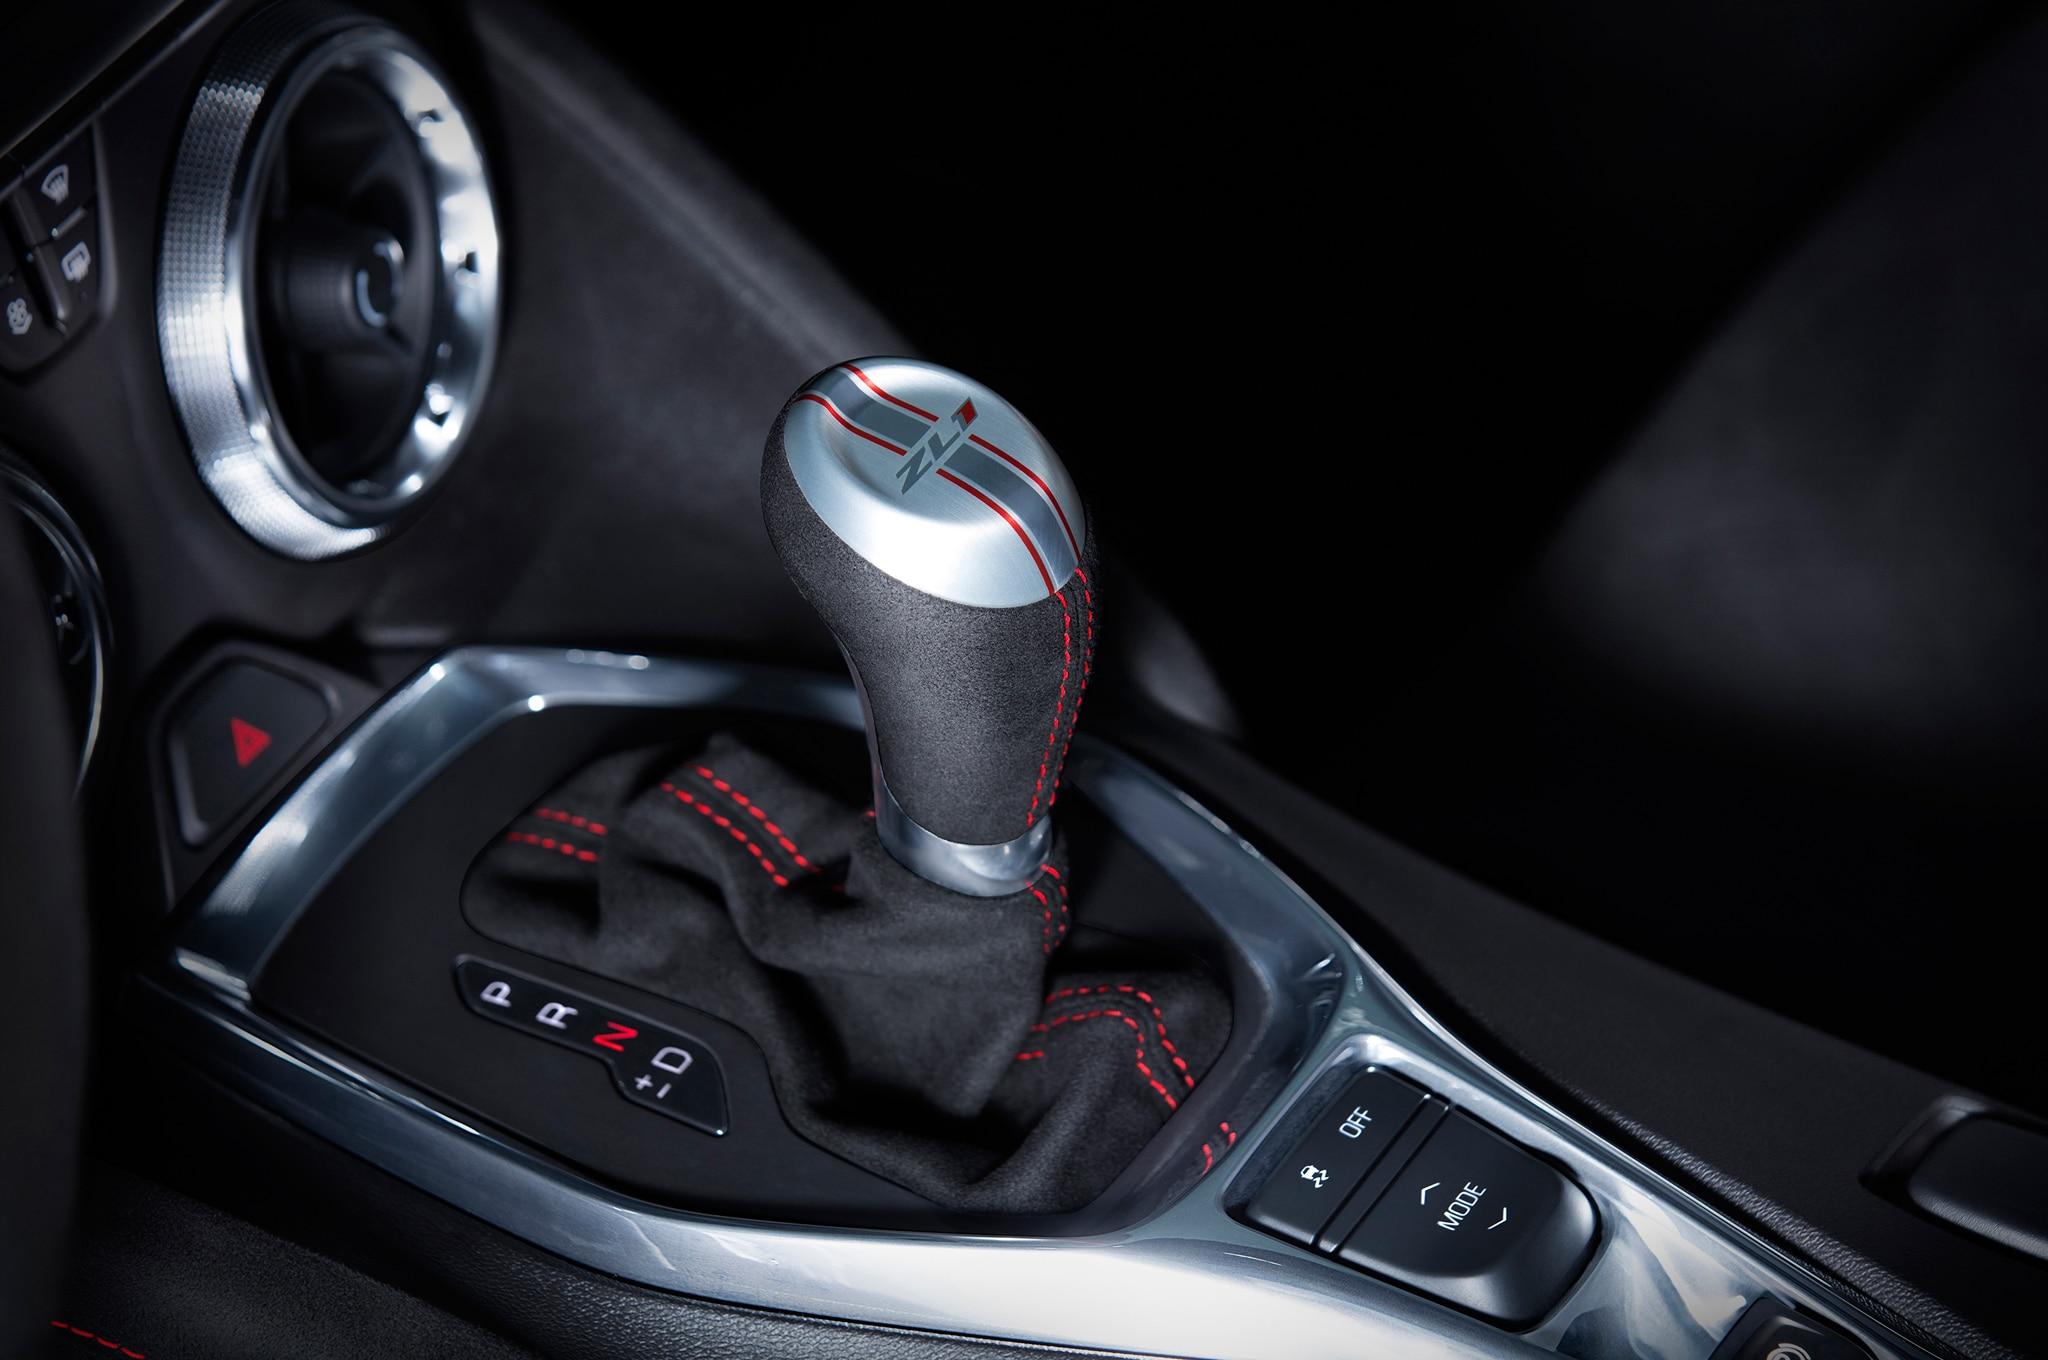 2017 Chevrolet Camaro ZL1 gear shifter